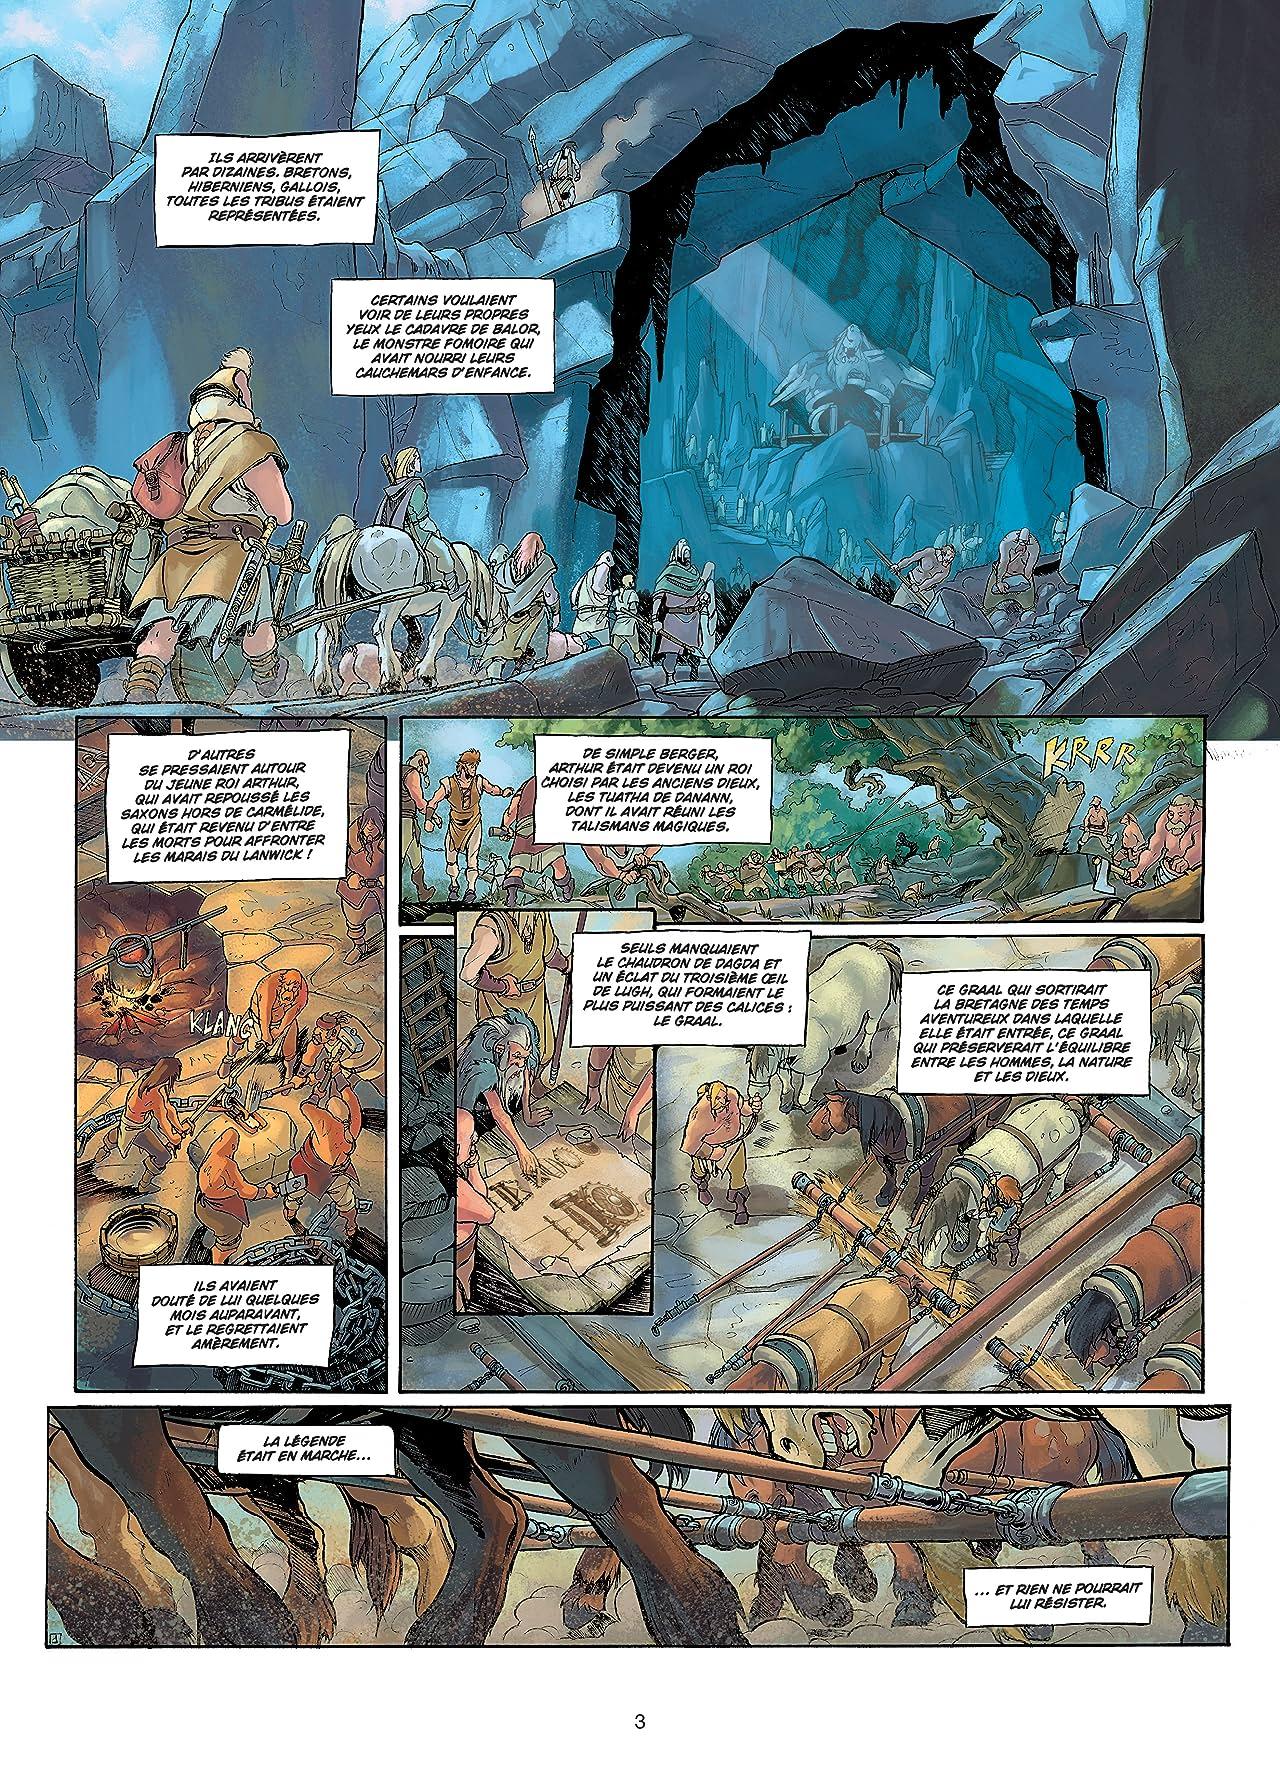 La Quête du graal Vol. 3: Les Chevaliers de la table ronde